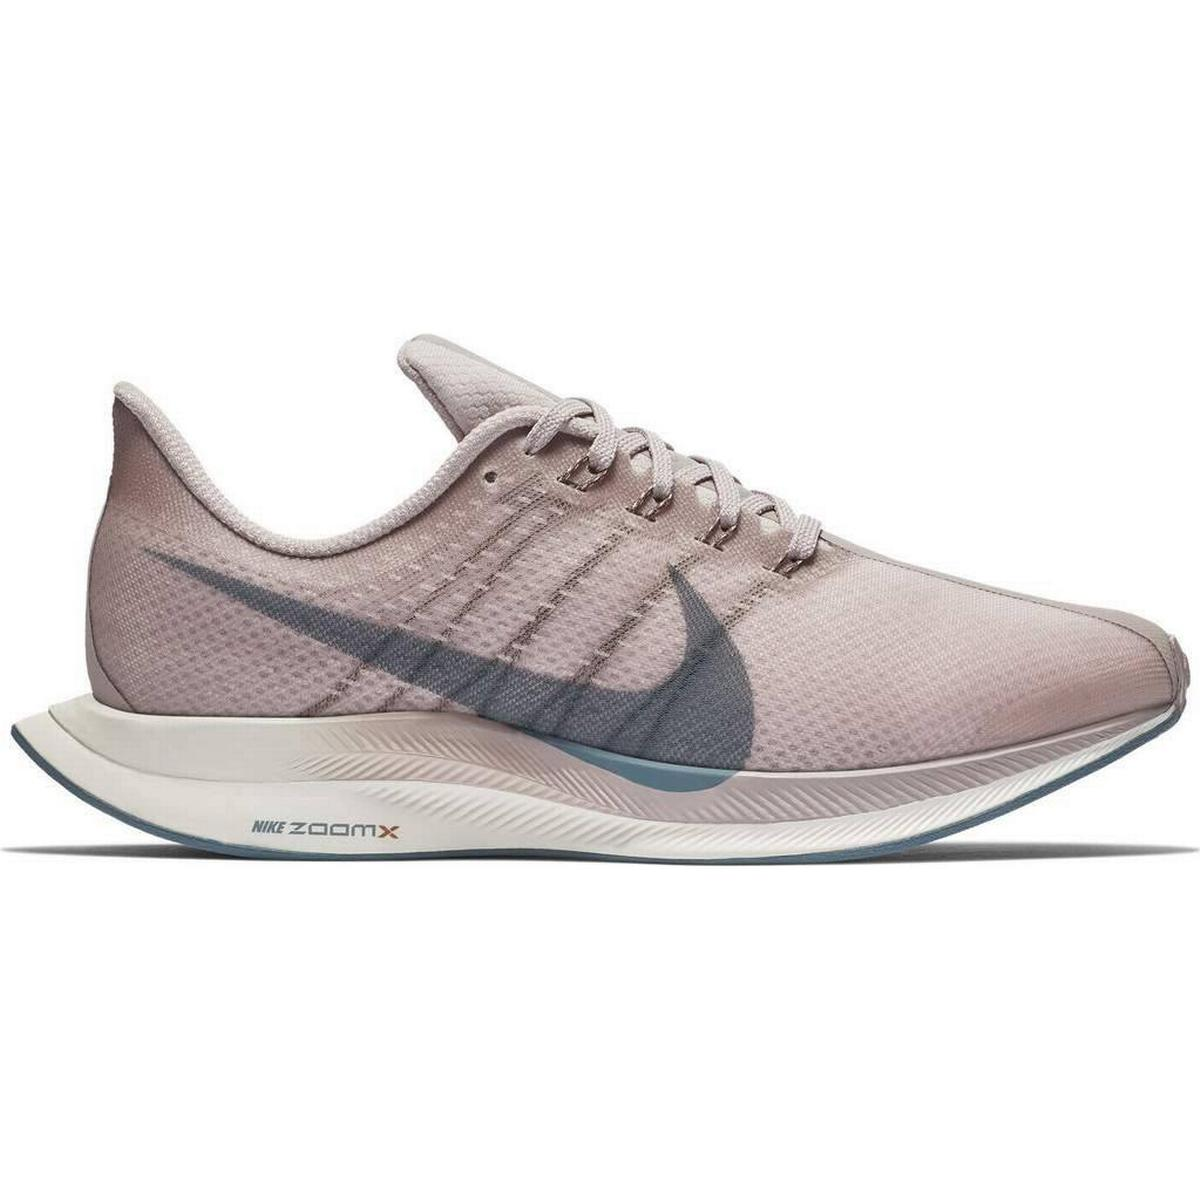 Nike sko lyserød Sammenlign priser hos PriceRunner